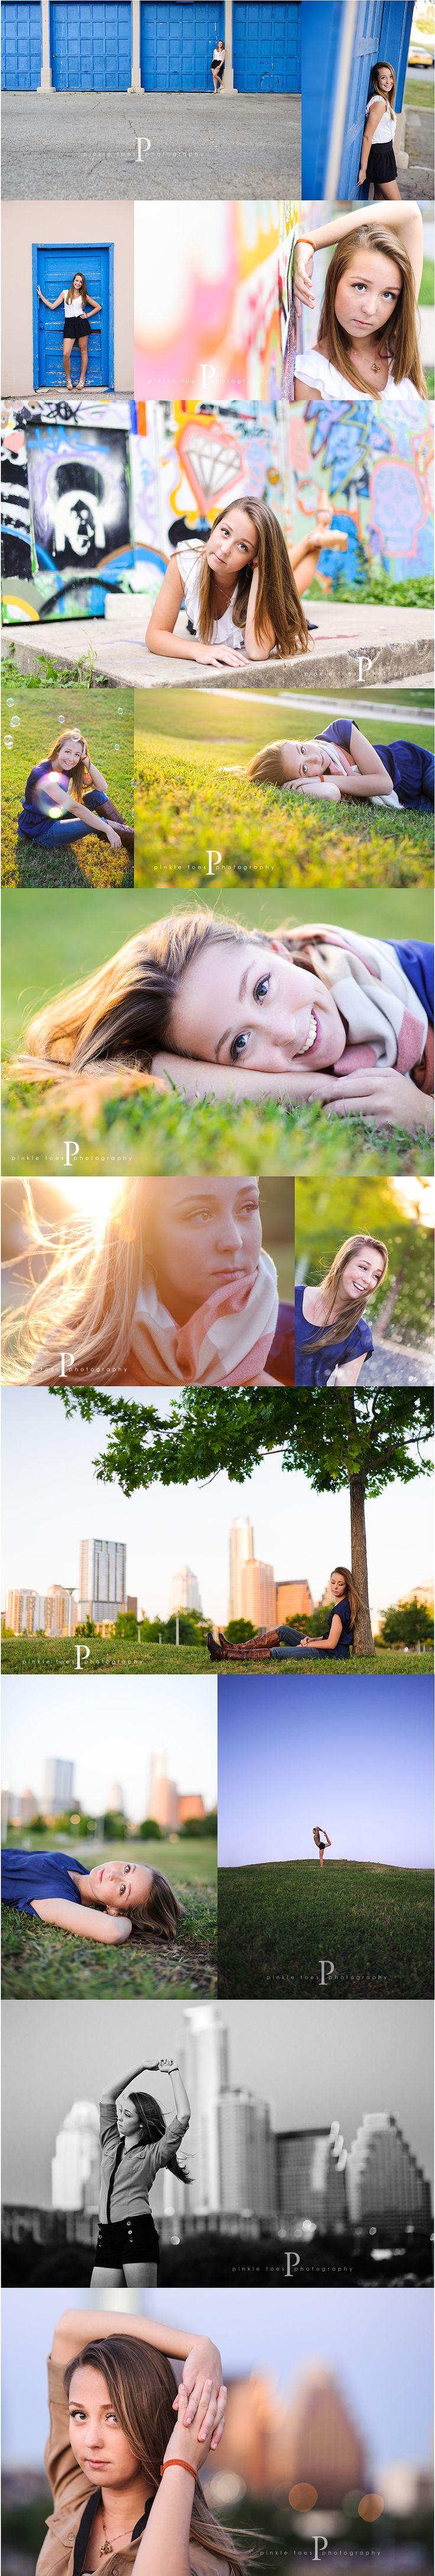 https://www.facebook.com/pages/Modeling-make-my-dream-come-true/1731939043612052  m_austin-cool-hip-unique-modern-senior-urban-pictures.jpg